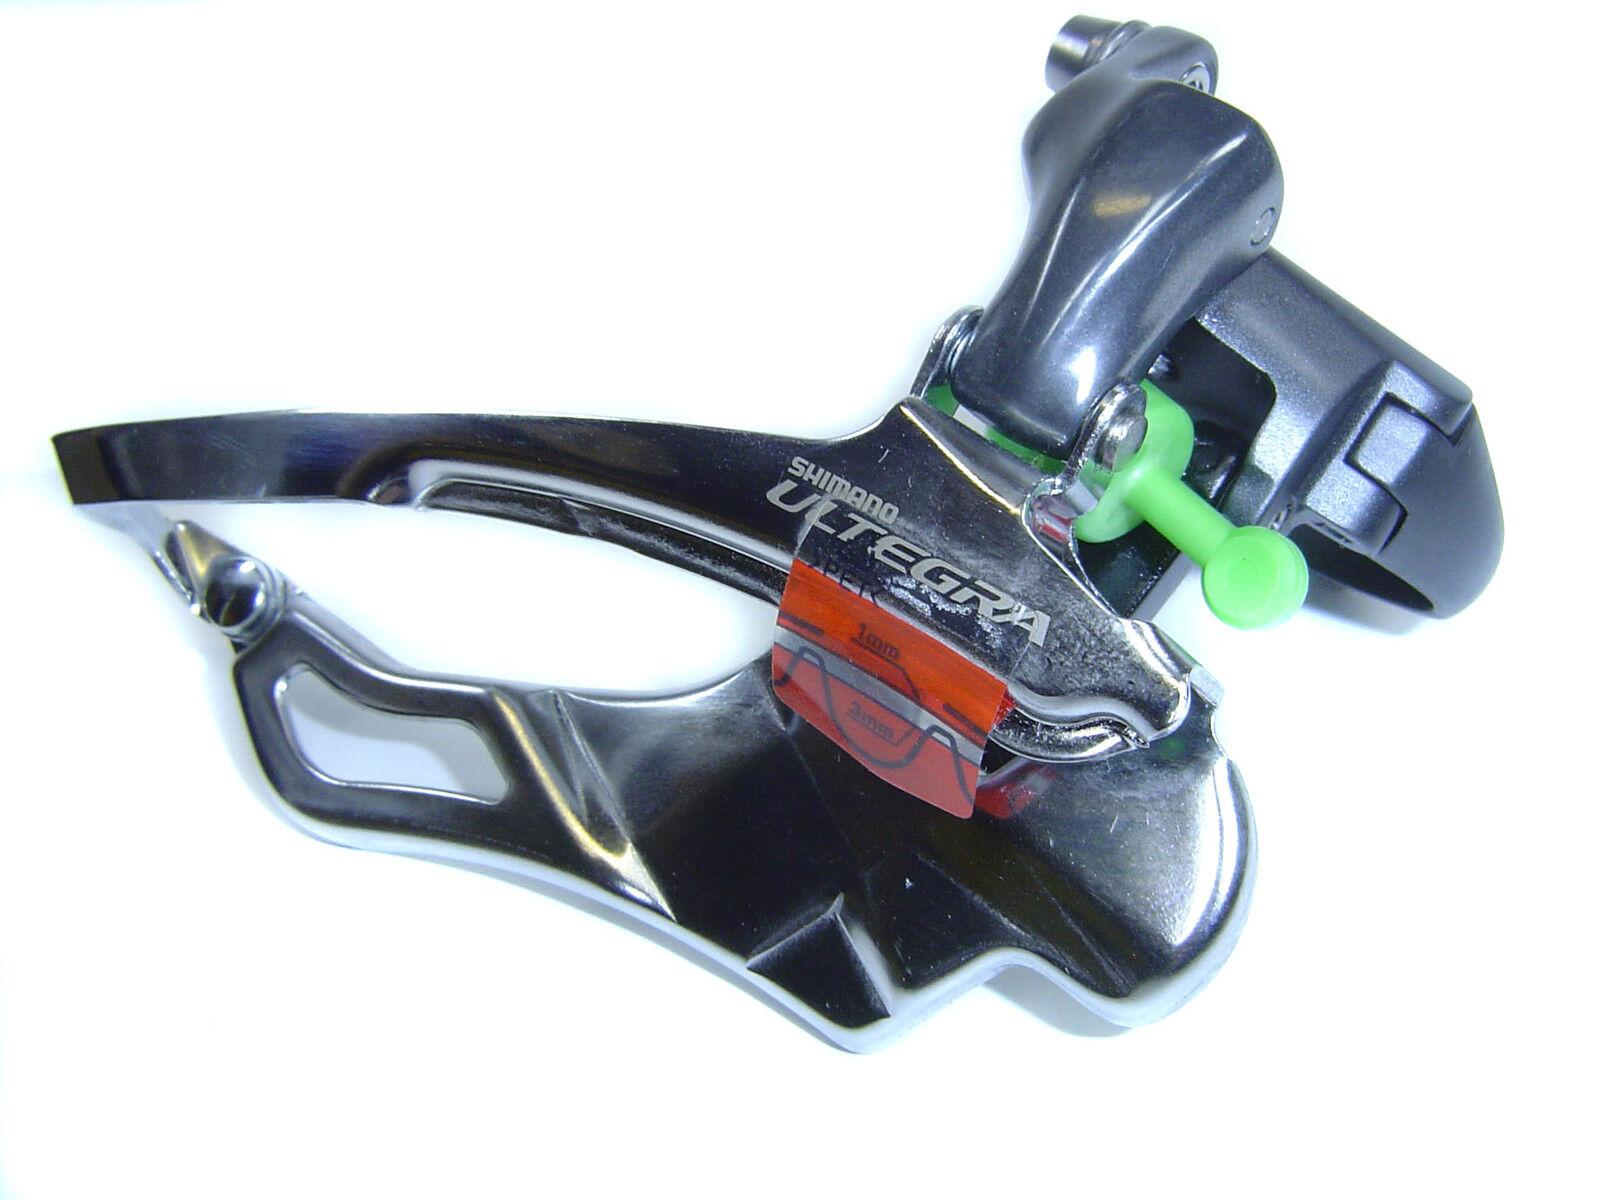 Shimano Ultegra Triple 3 x 10 Umwerfer FD-6703  34,9 Grau NEU